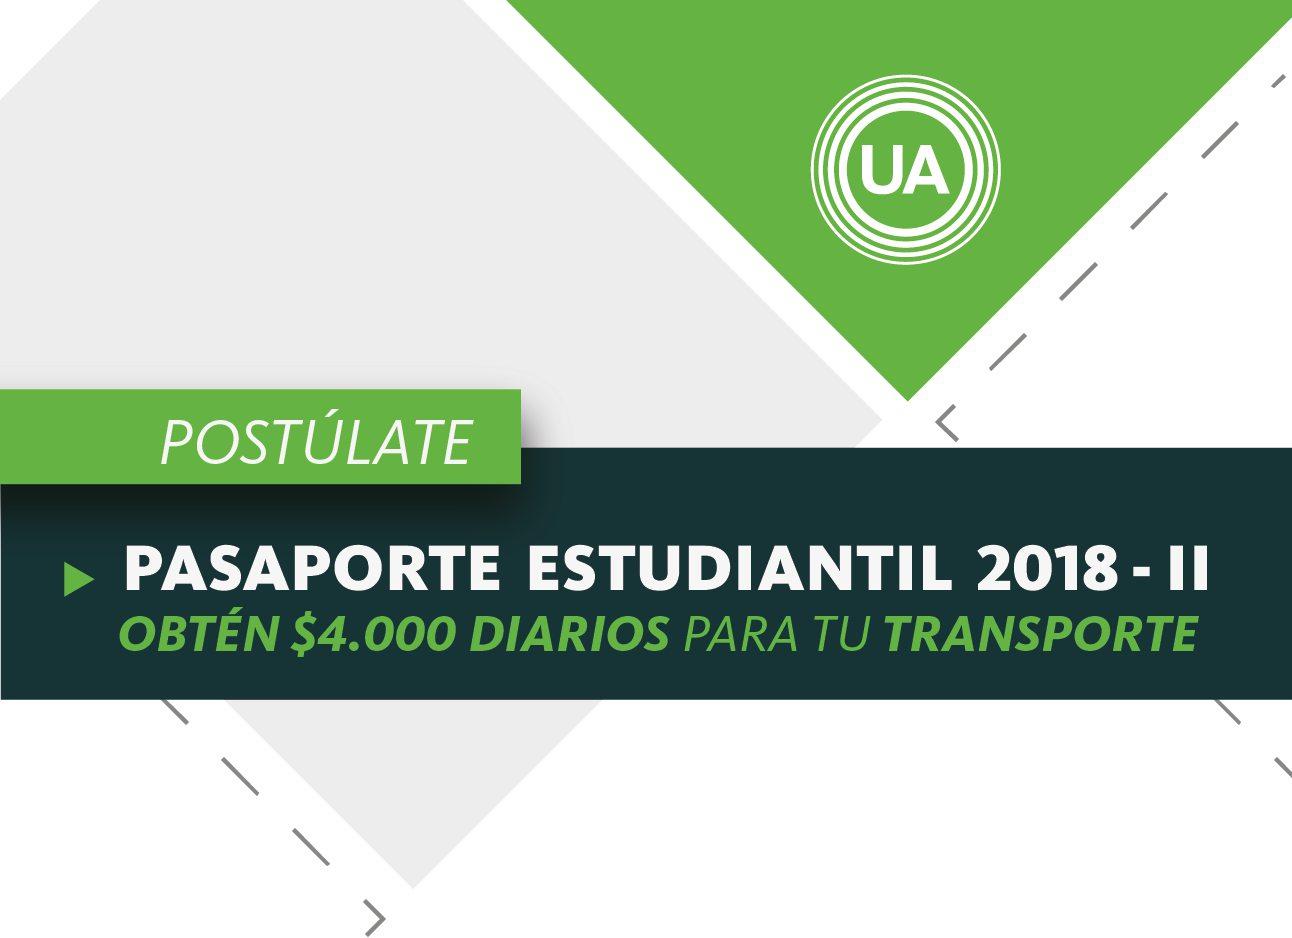 Pasaporte estudiantil 2018-II (Facatativá)